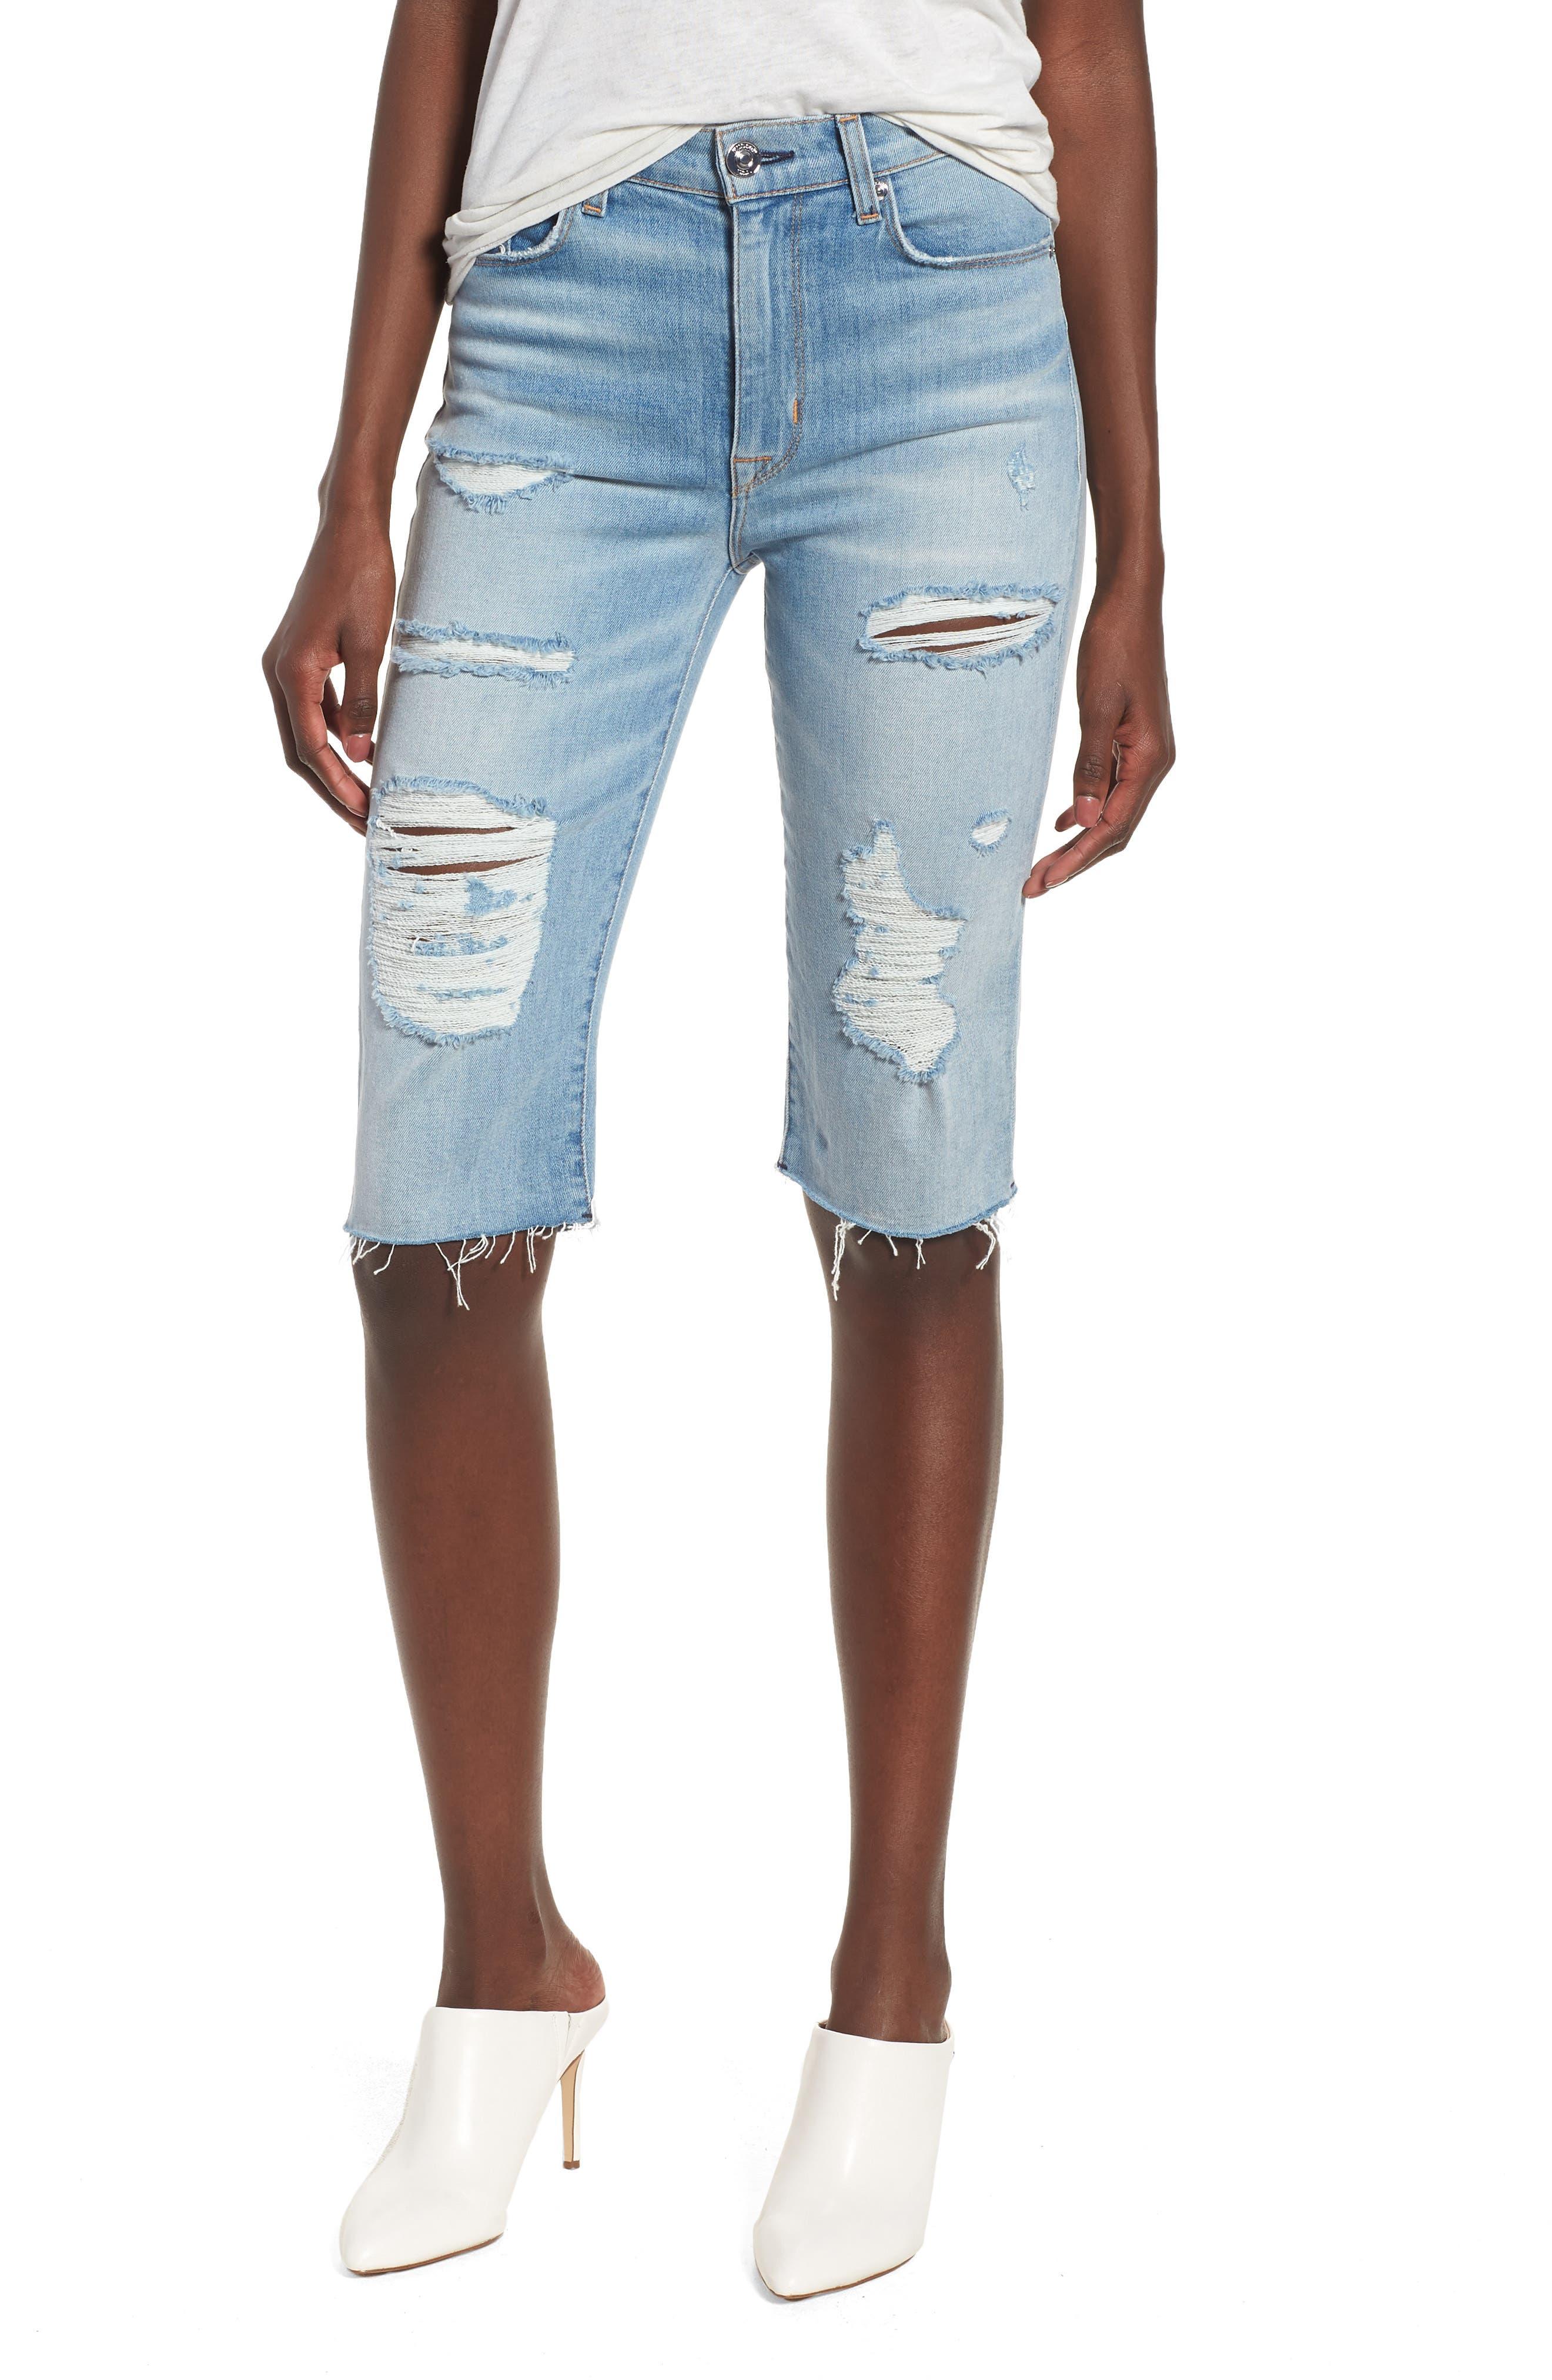 Alternate Image 1 Selected - Hudson Jeans Zoeey High Waist Cutoff Boyfriend Shorts (Love St.)